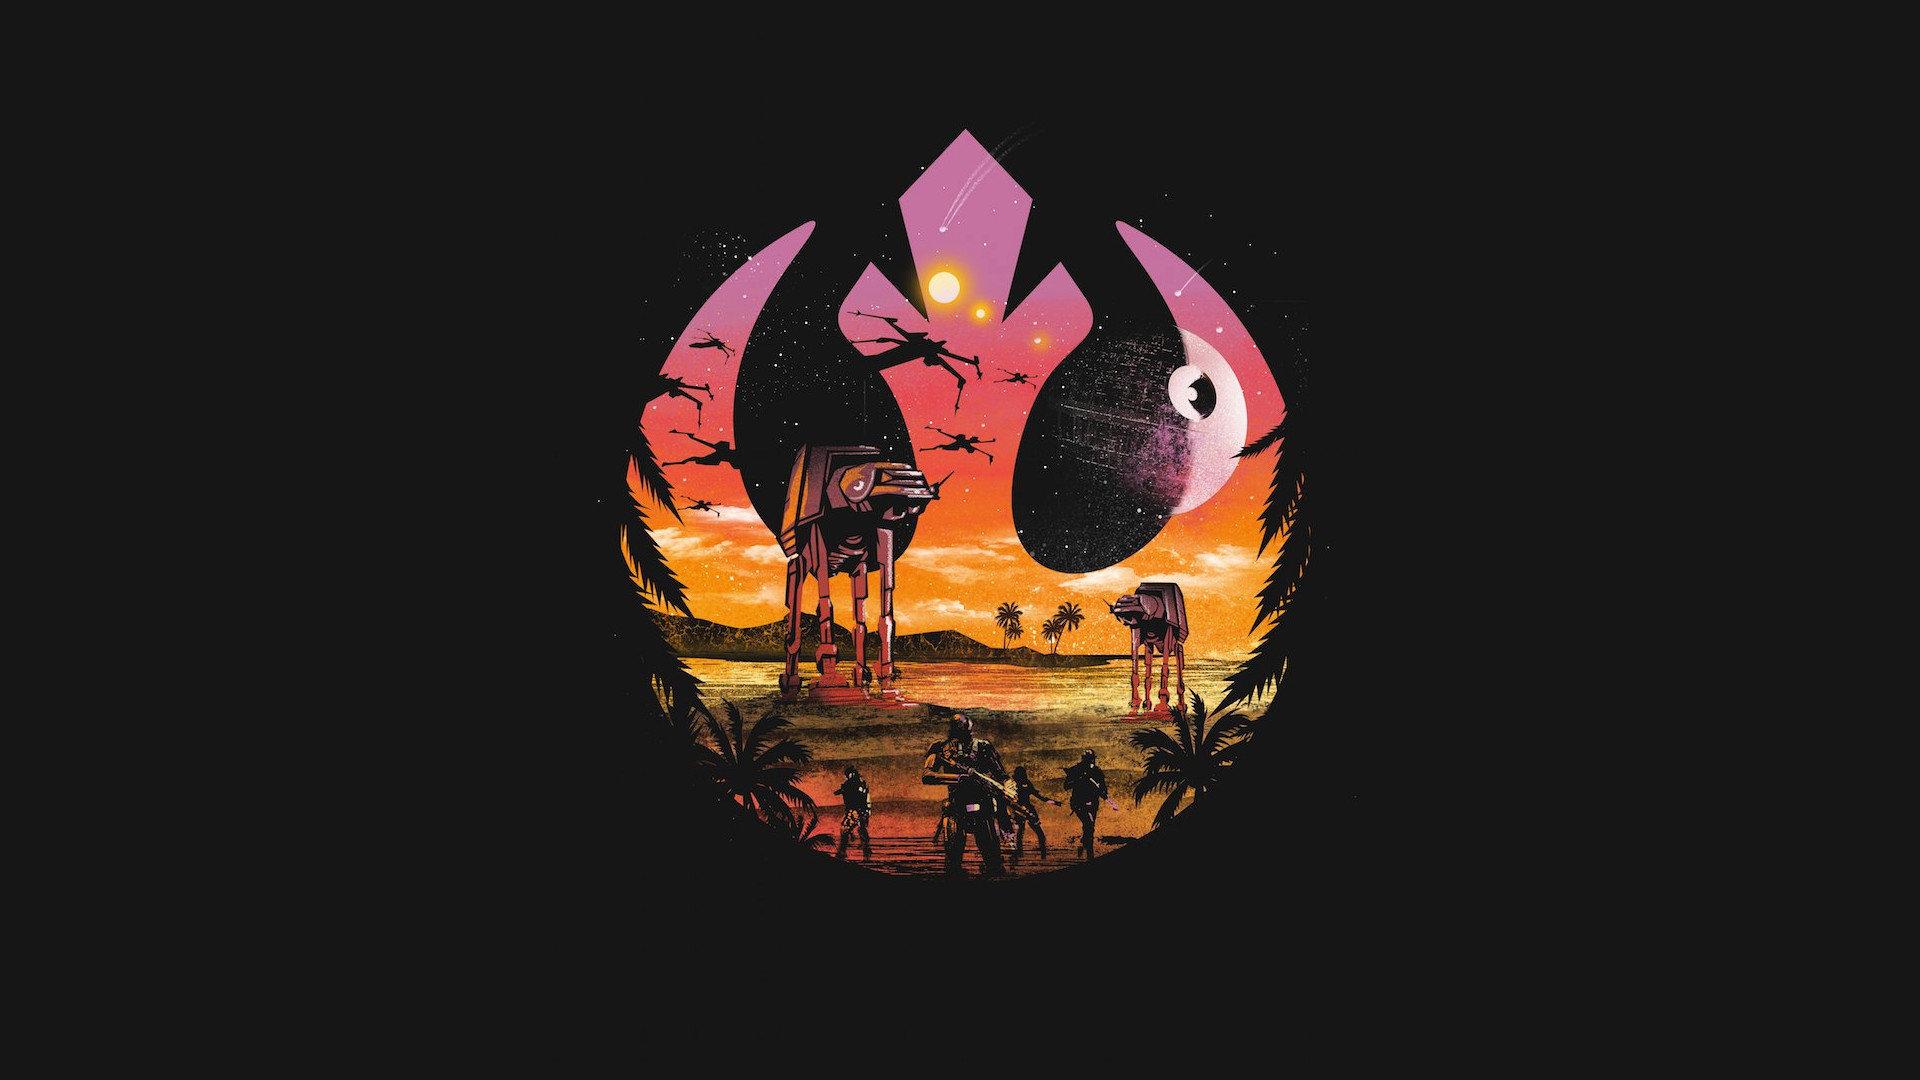 Best Rogue One Star Wars Font Art 910197 Hd Wallpaper Backgrounds Download